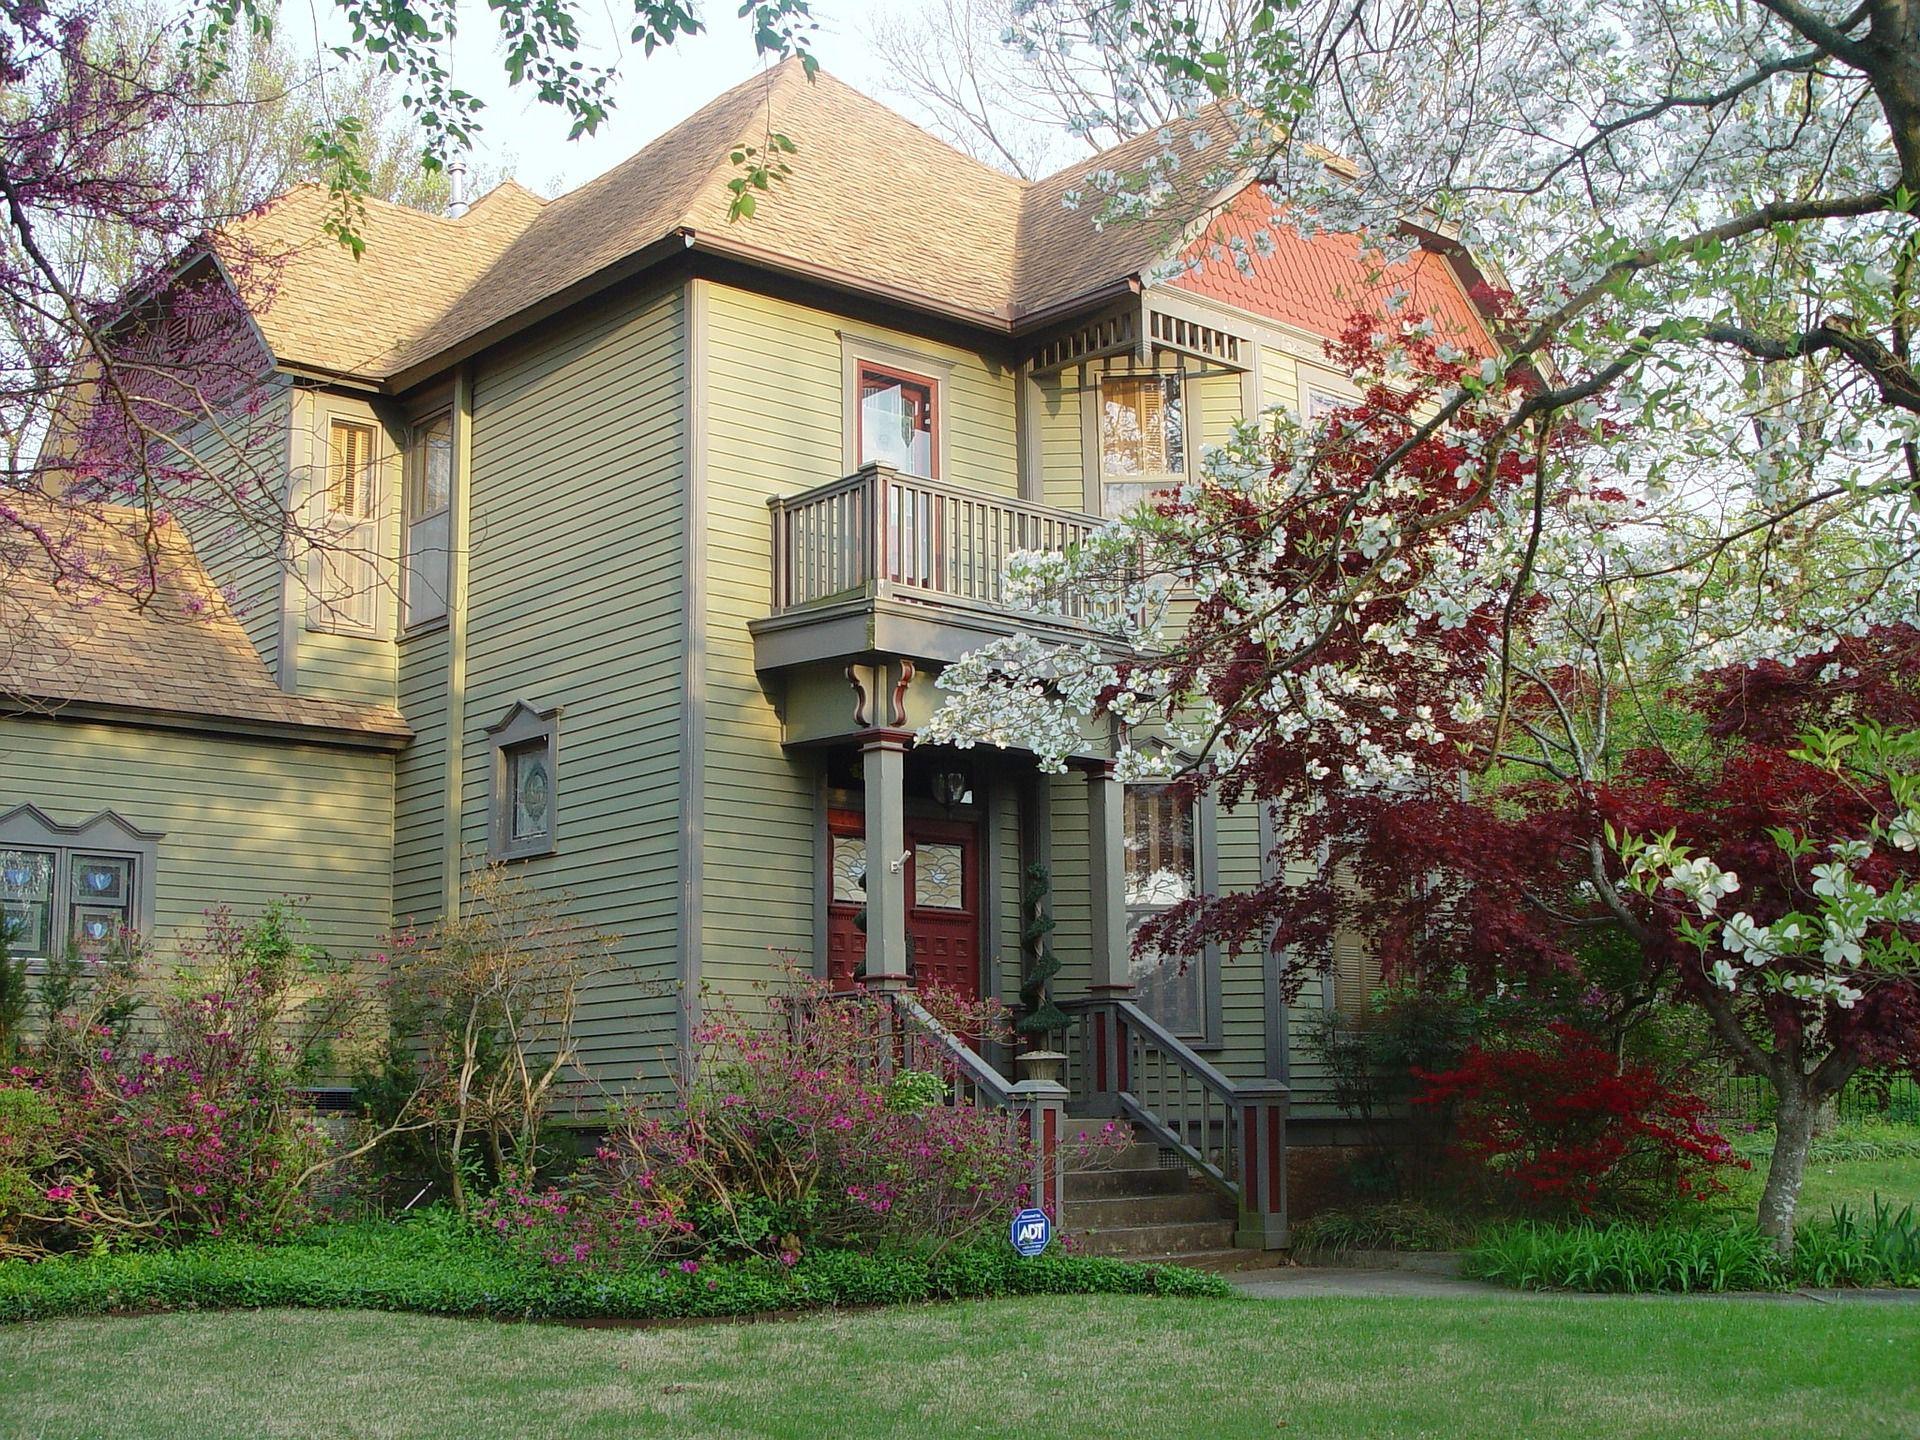 Best Trees to Plant - 15 Options for the Backyard - Bob Vila